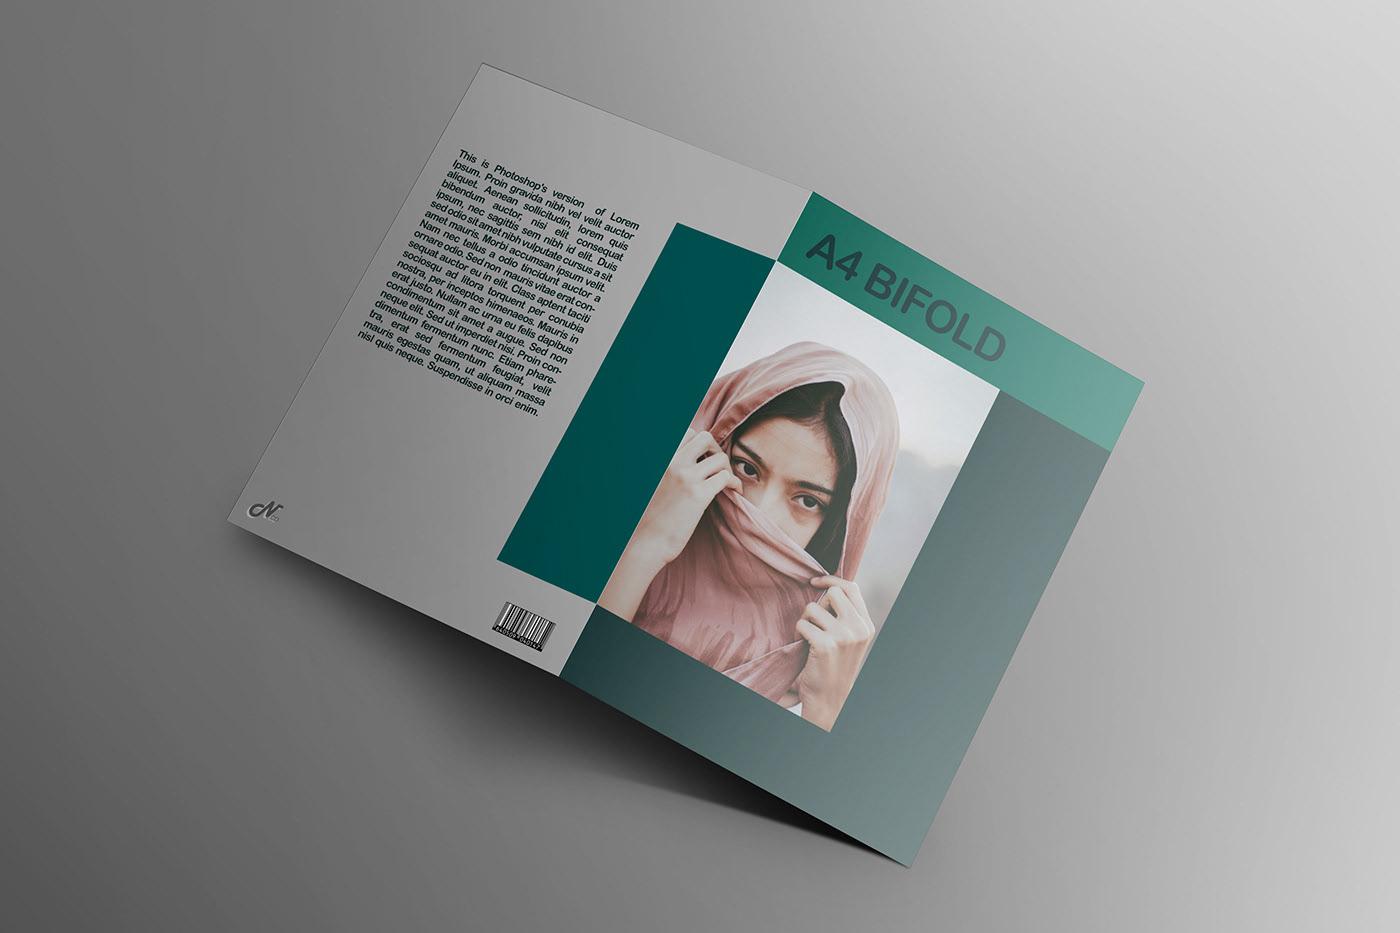 Image may contain: human face, book and print